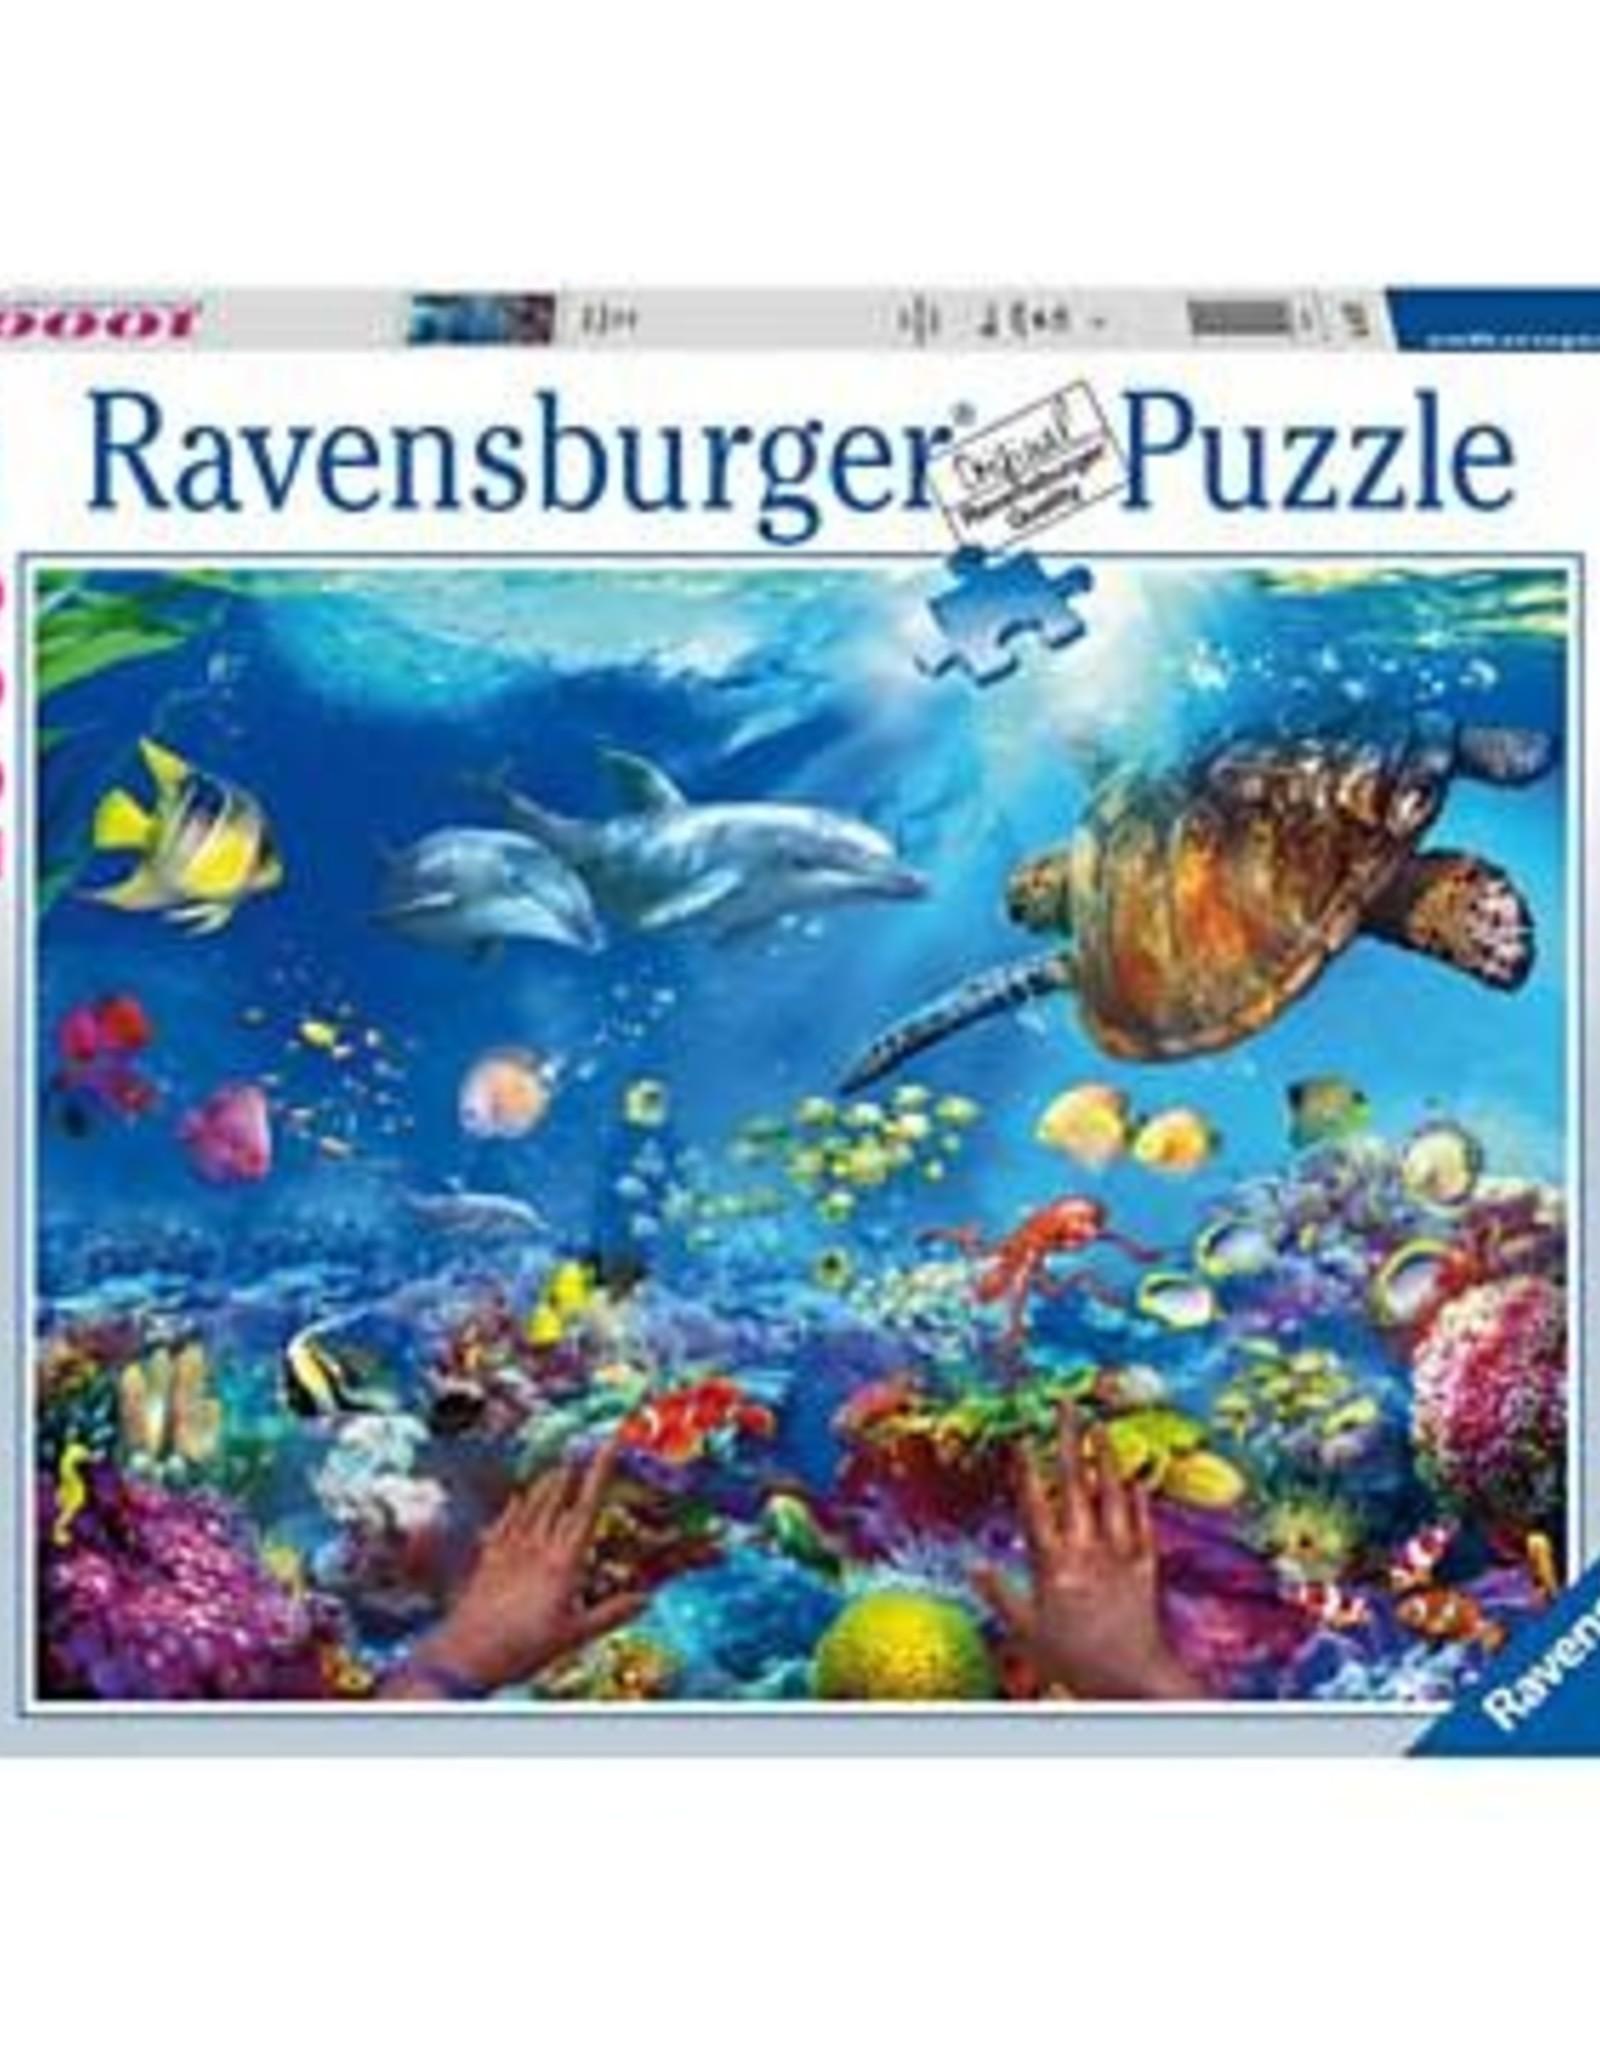 Ravensburger 1000pc puzzle Snorkeling